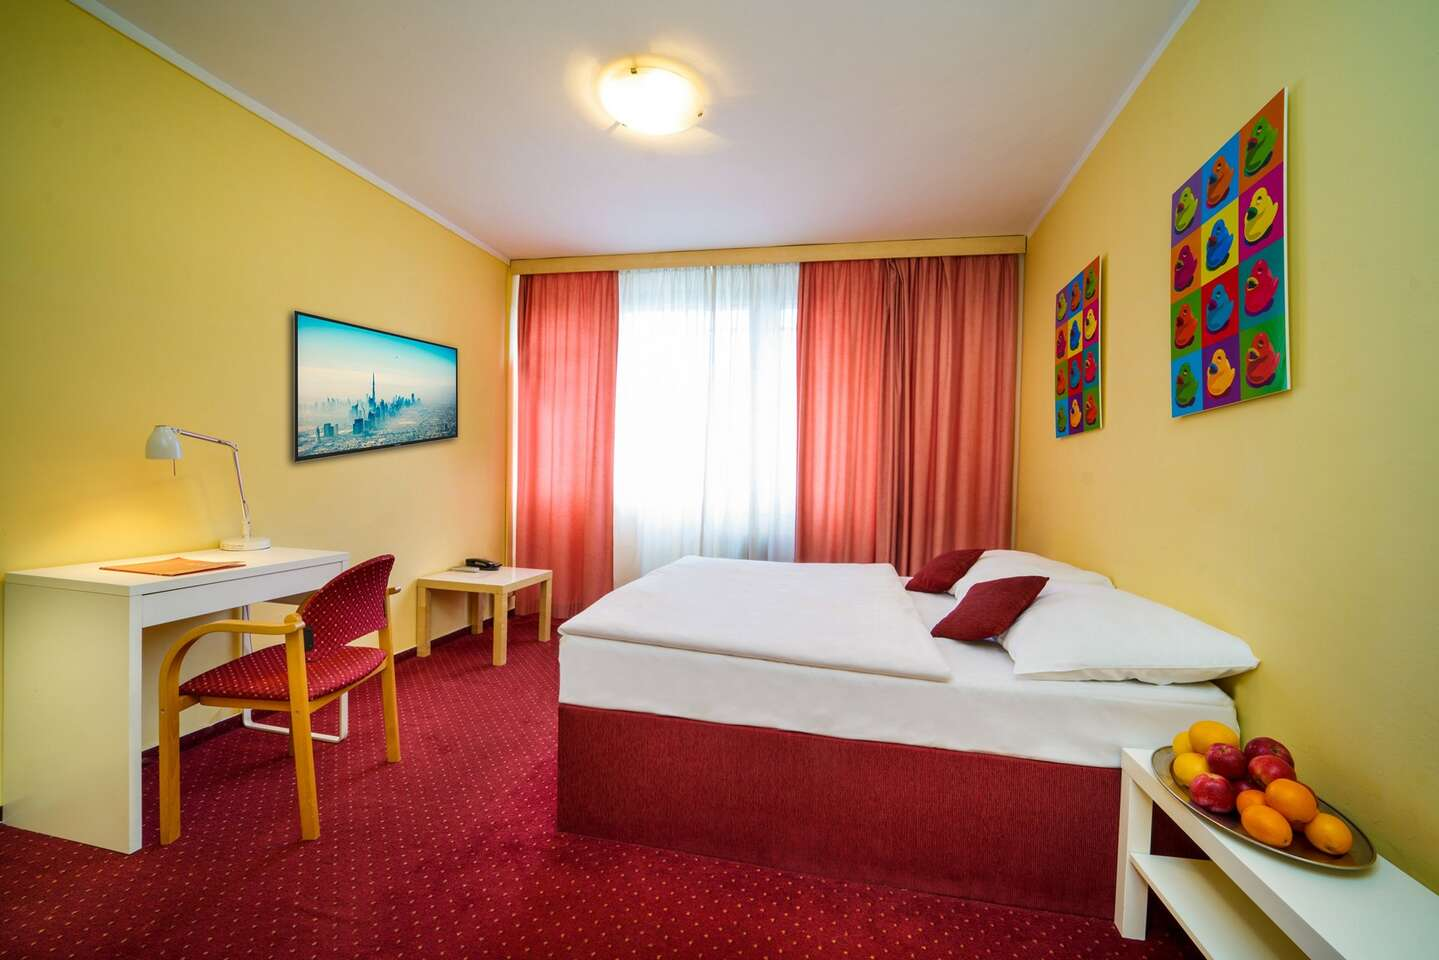 Priestranné izby hotela UNO*** v Prahe s raňajkami len 12 min. od centra